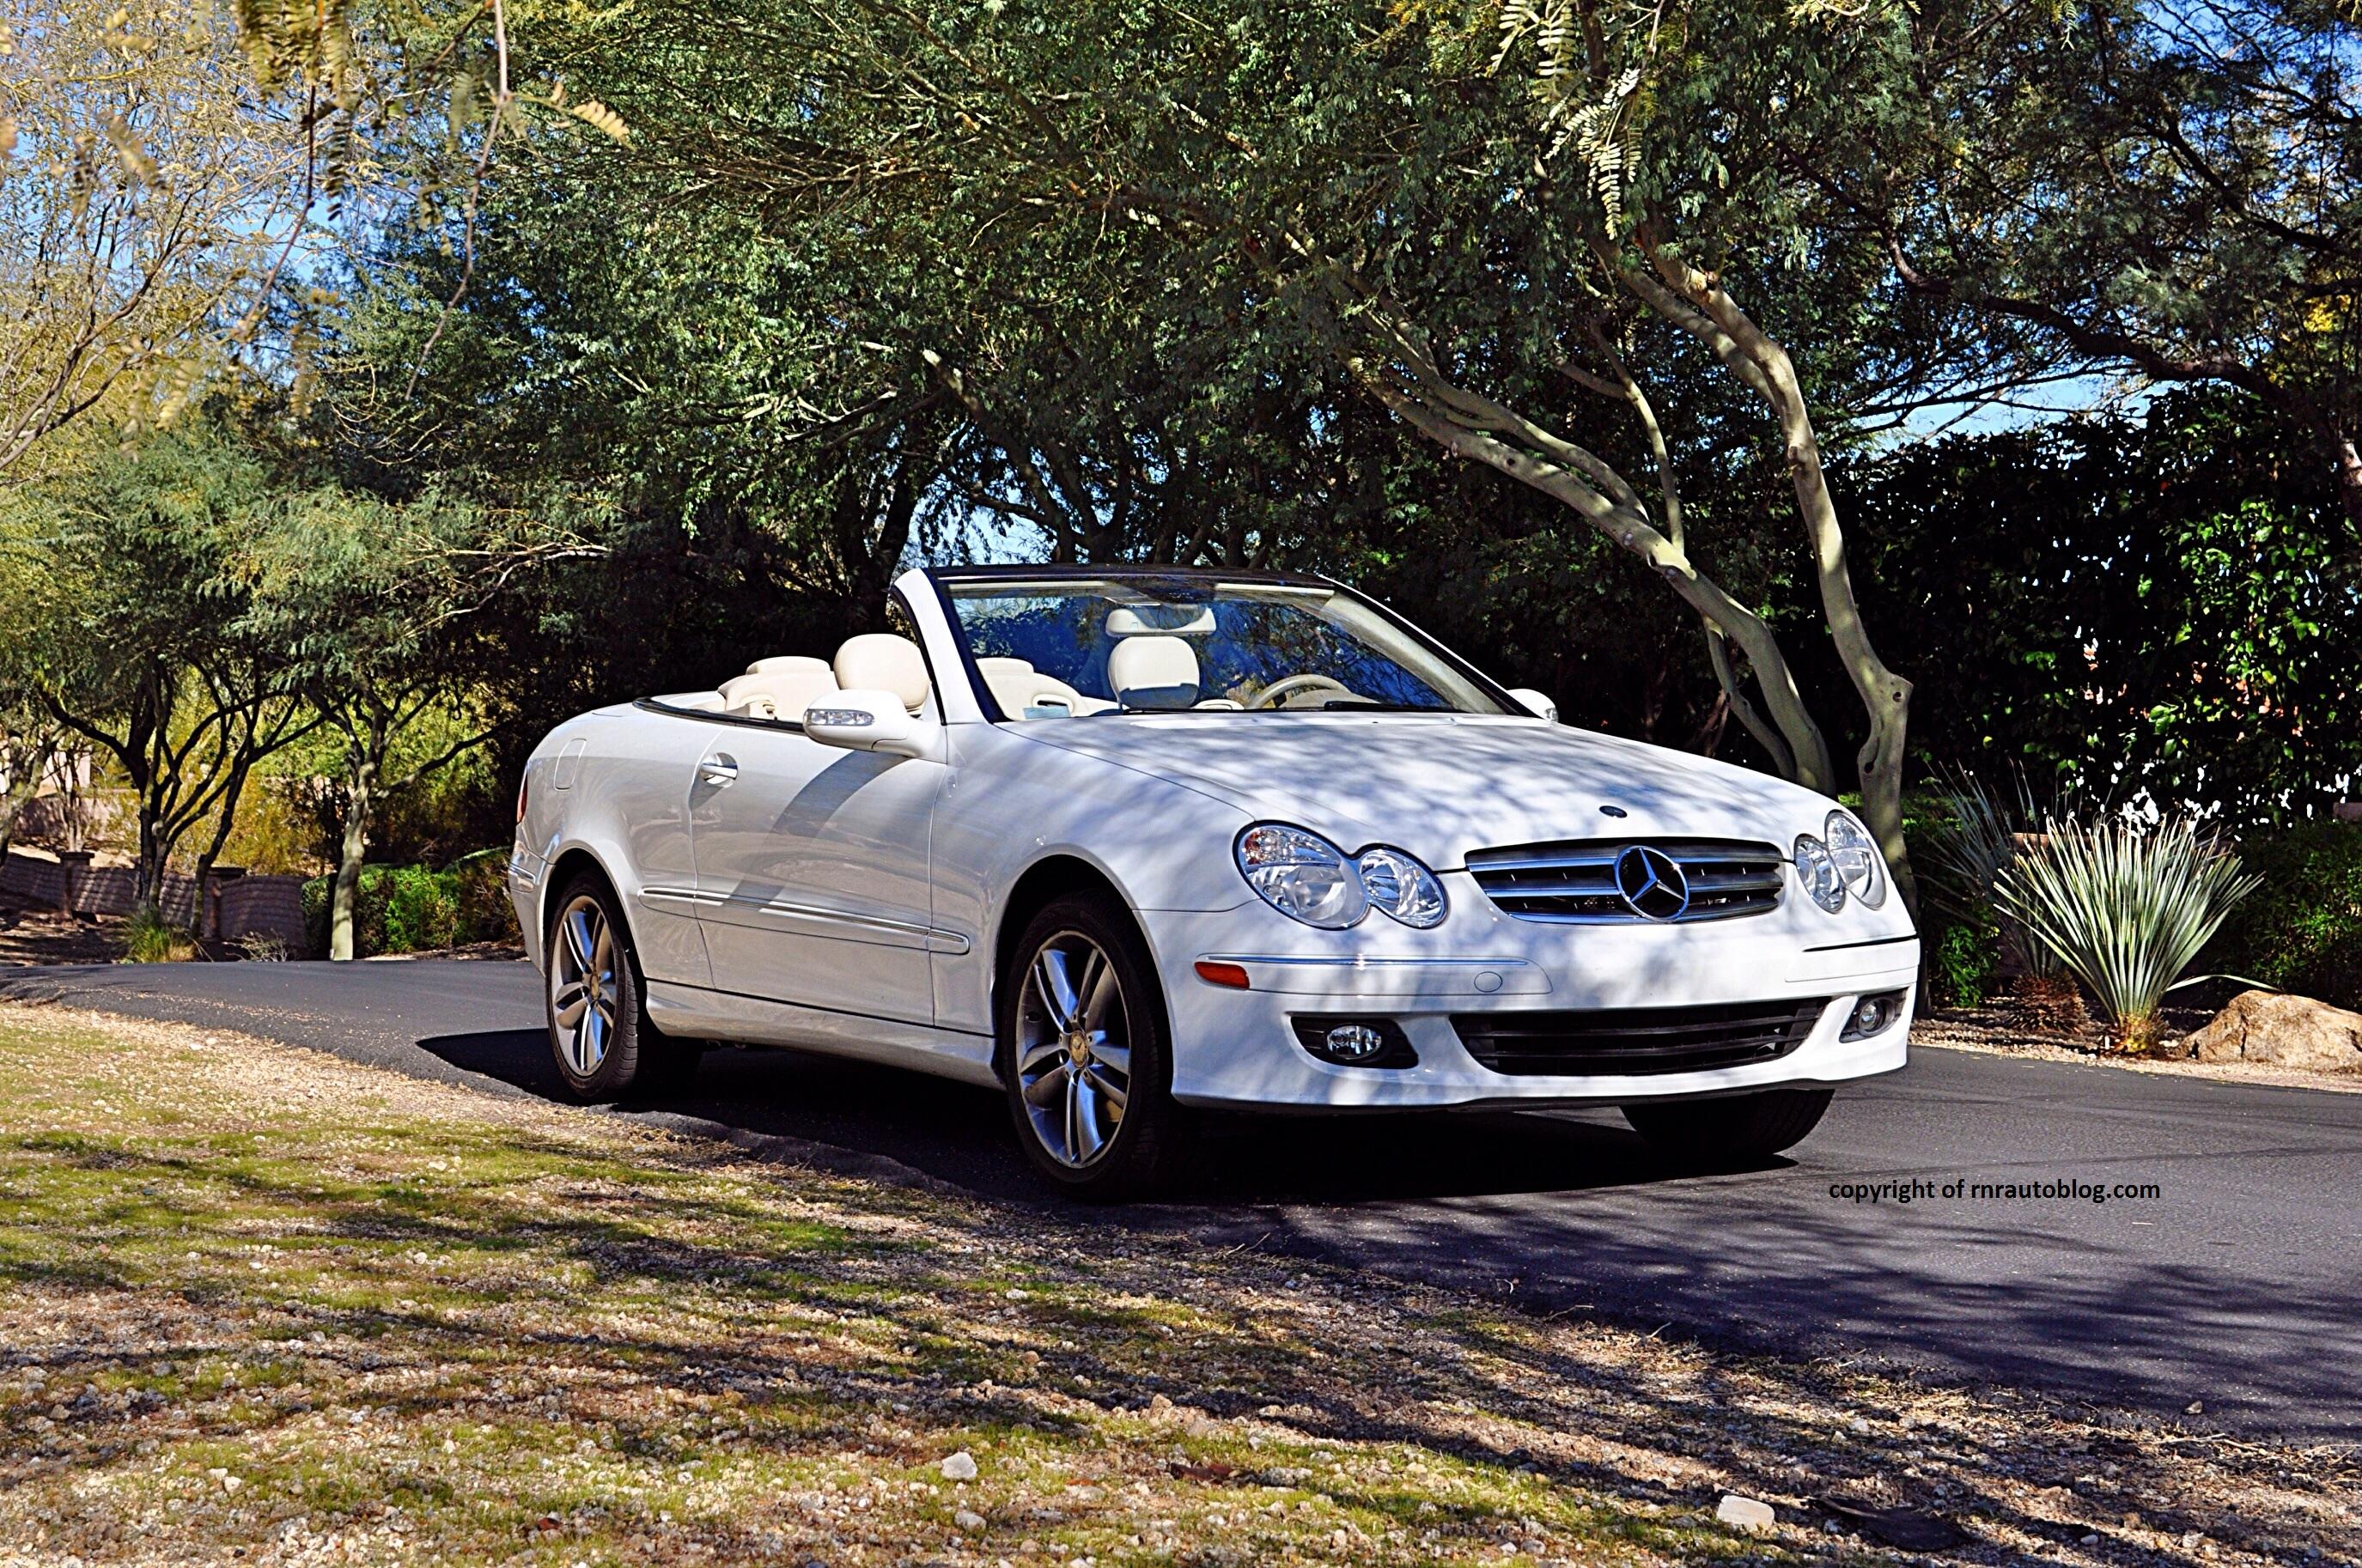 2008 mercedes benz clk350 convertible review rnr for 2014 mercedes benz clk350